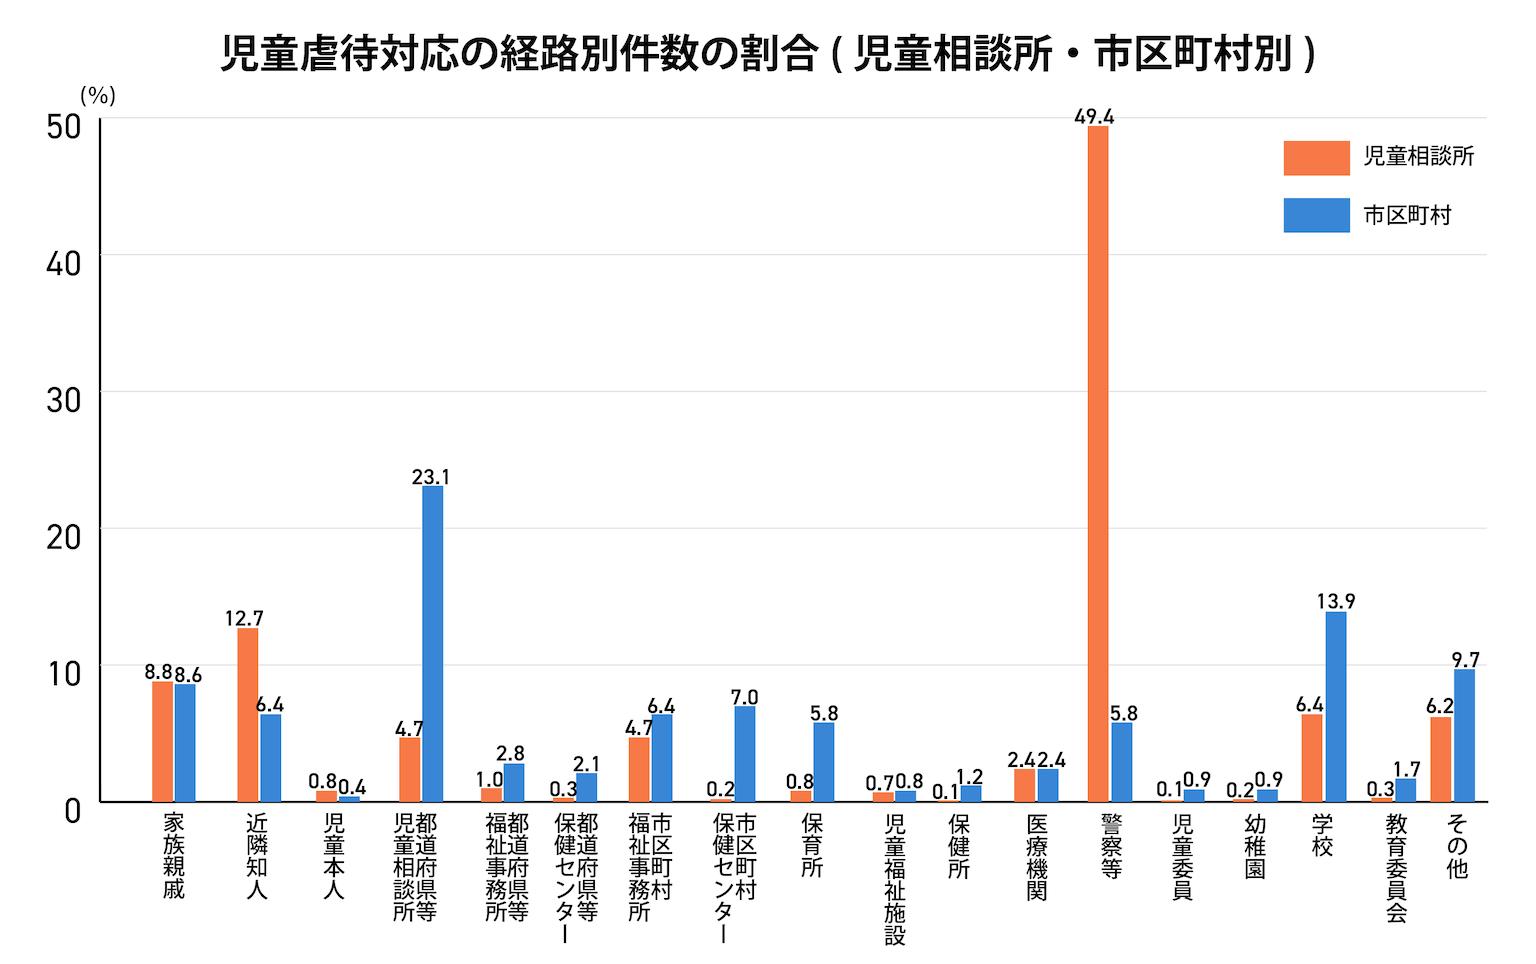 児童虐待対応の経路別件数の割合(児童相談所・市区町村別)